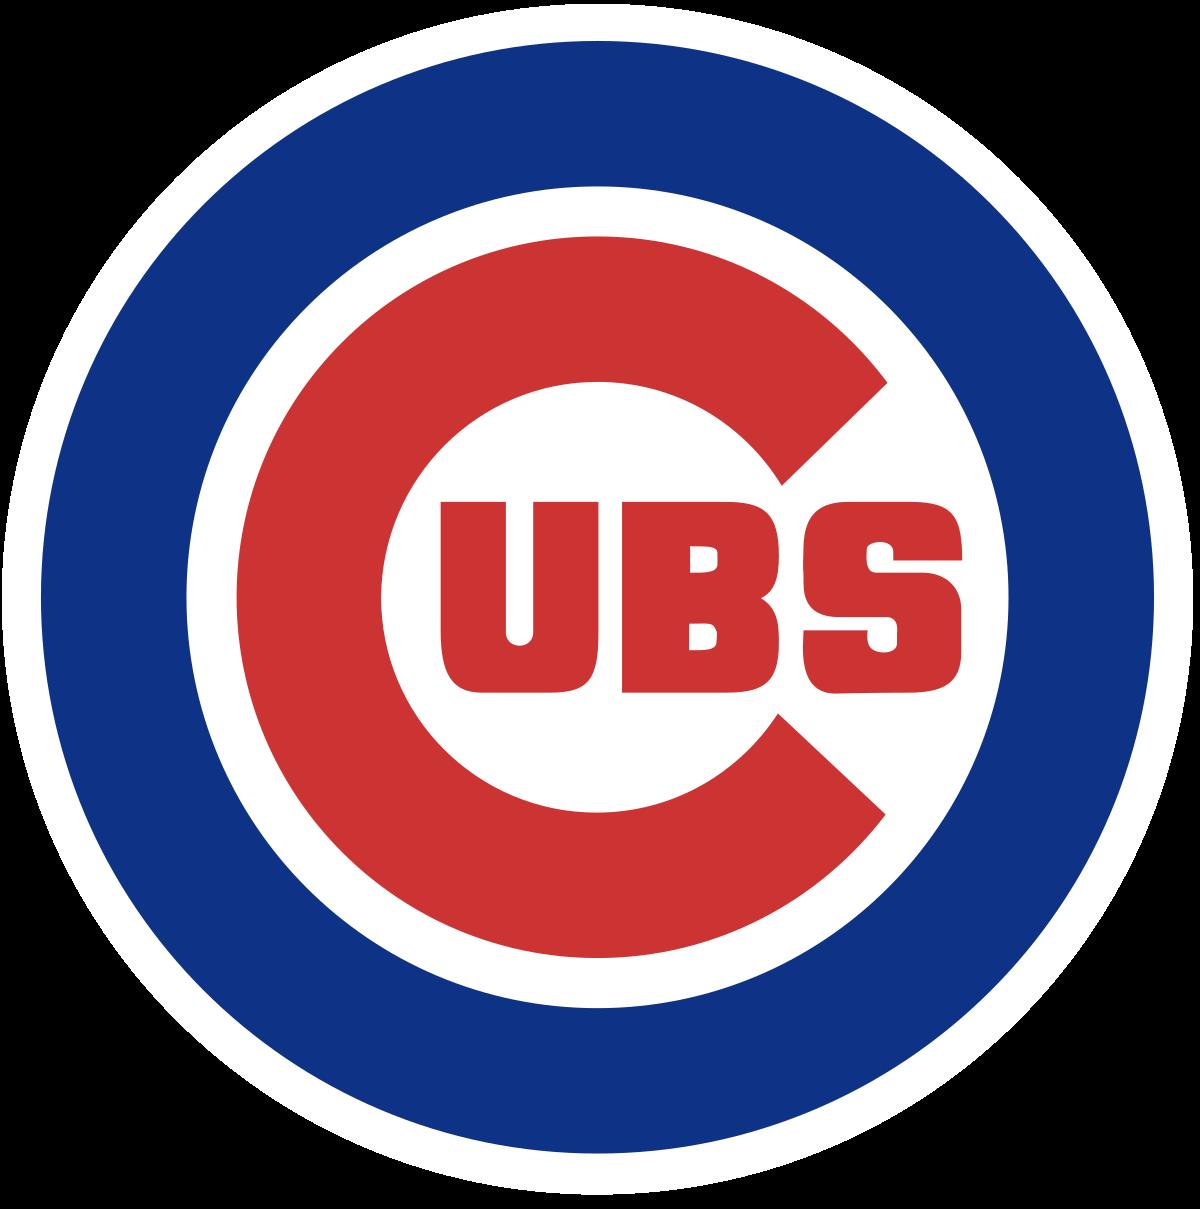 Chicago Cubs Logo Png Image Chicago Cubs Logo Chicago Cubs Baseball Chicago Cubs